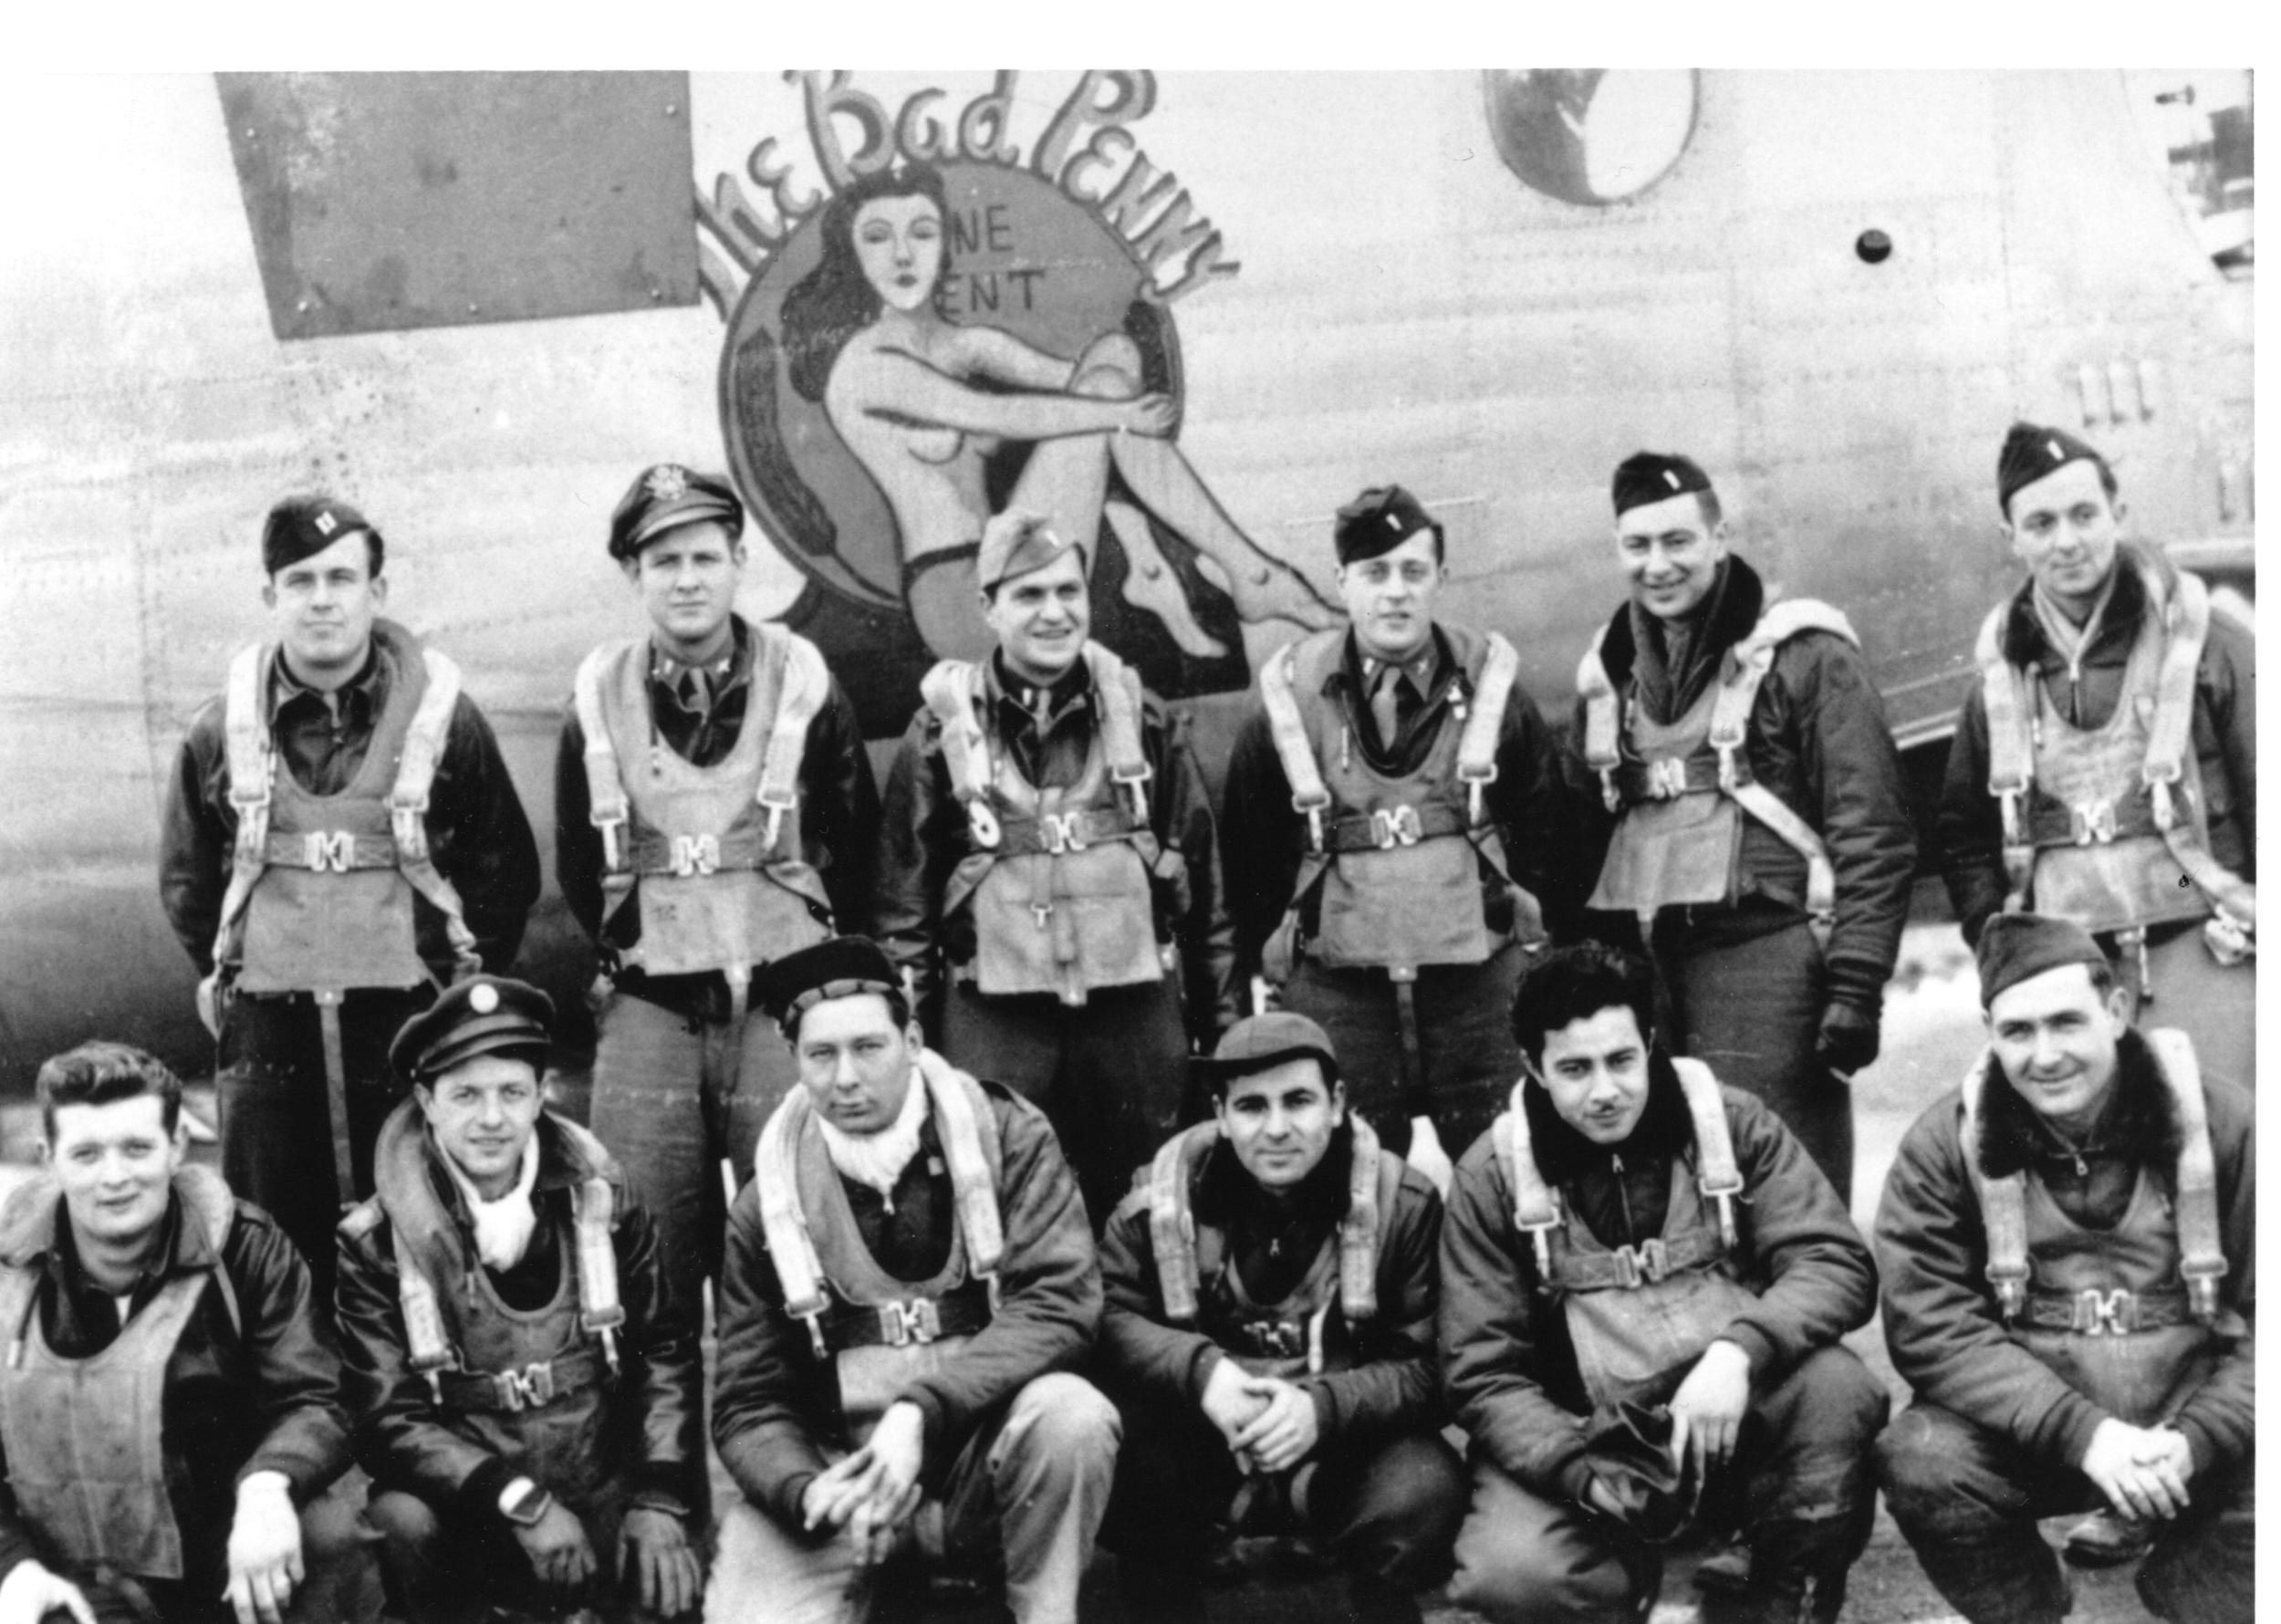 Front row, L to R: Bob Sims, radio operator; Joe Skomro, engineer; John Hubicz, tail gunner; Haig Mesrobian, ball gunner; Santos Cabral, waist gunner; John Shinske, waist gunner. Back row, L to R: Web Uebelhoer, pilot; Billy Hart, copilot; Art Kugel, bombardier; Jim Fleur, radar navigator; Mervin Scheu, dead reckoning navigator; Don Whitefield, navigator.